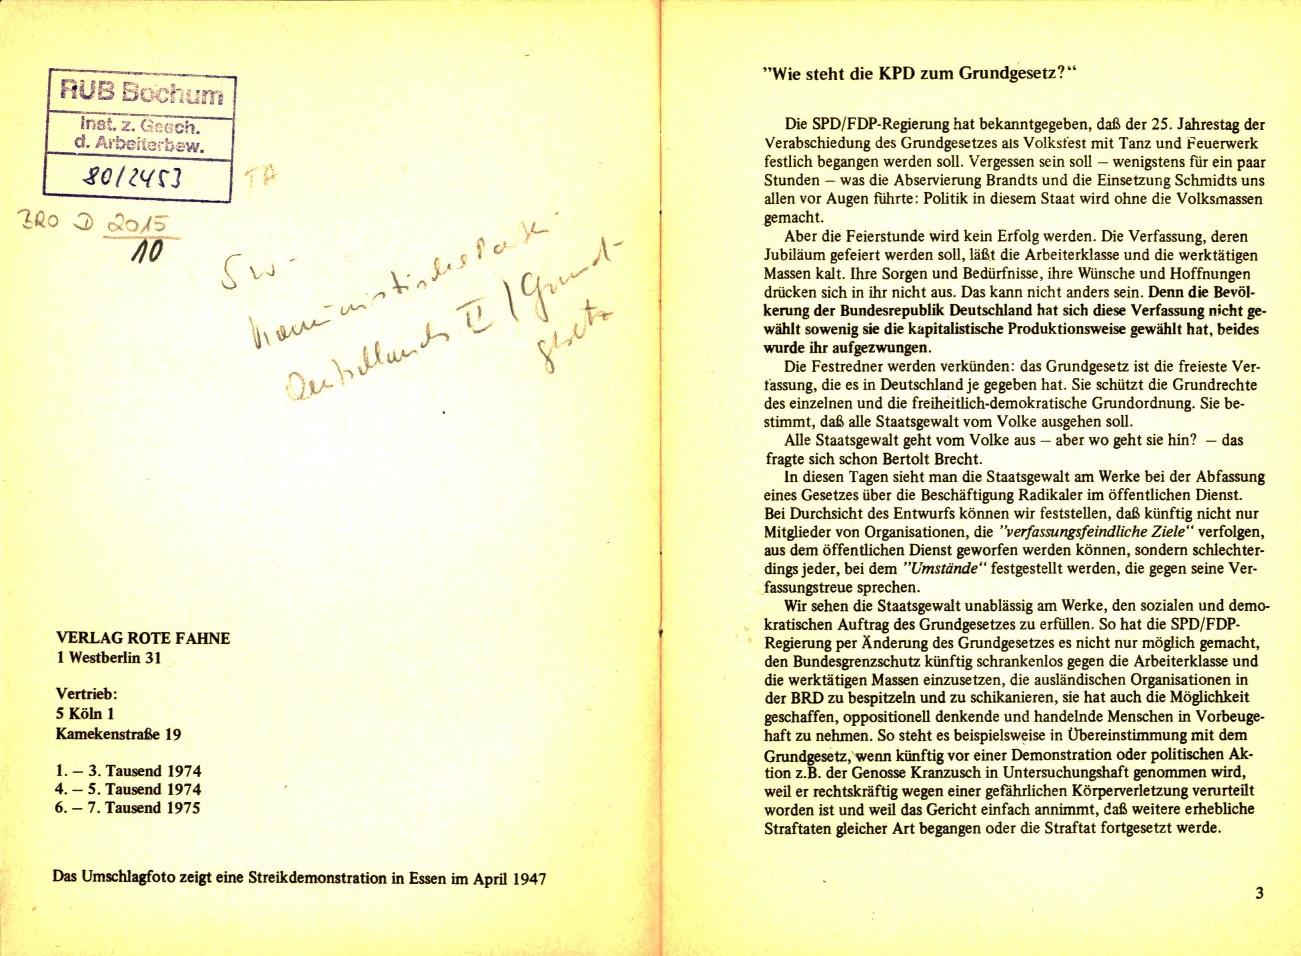 KPDAO_1974_Grundgesetz_03